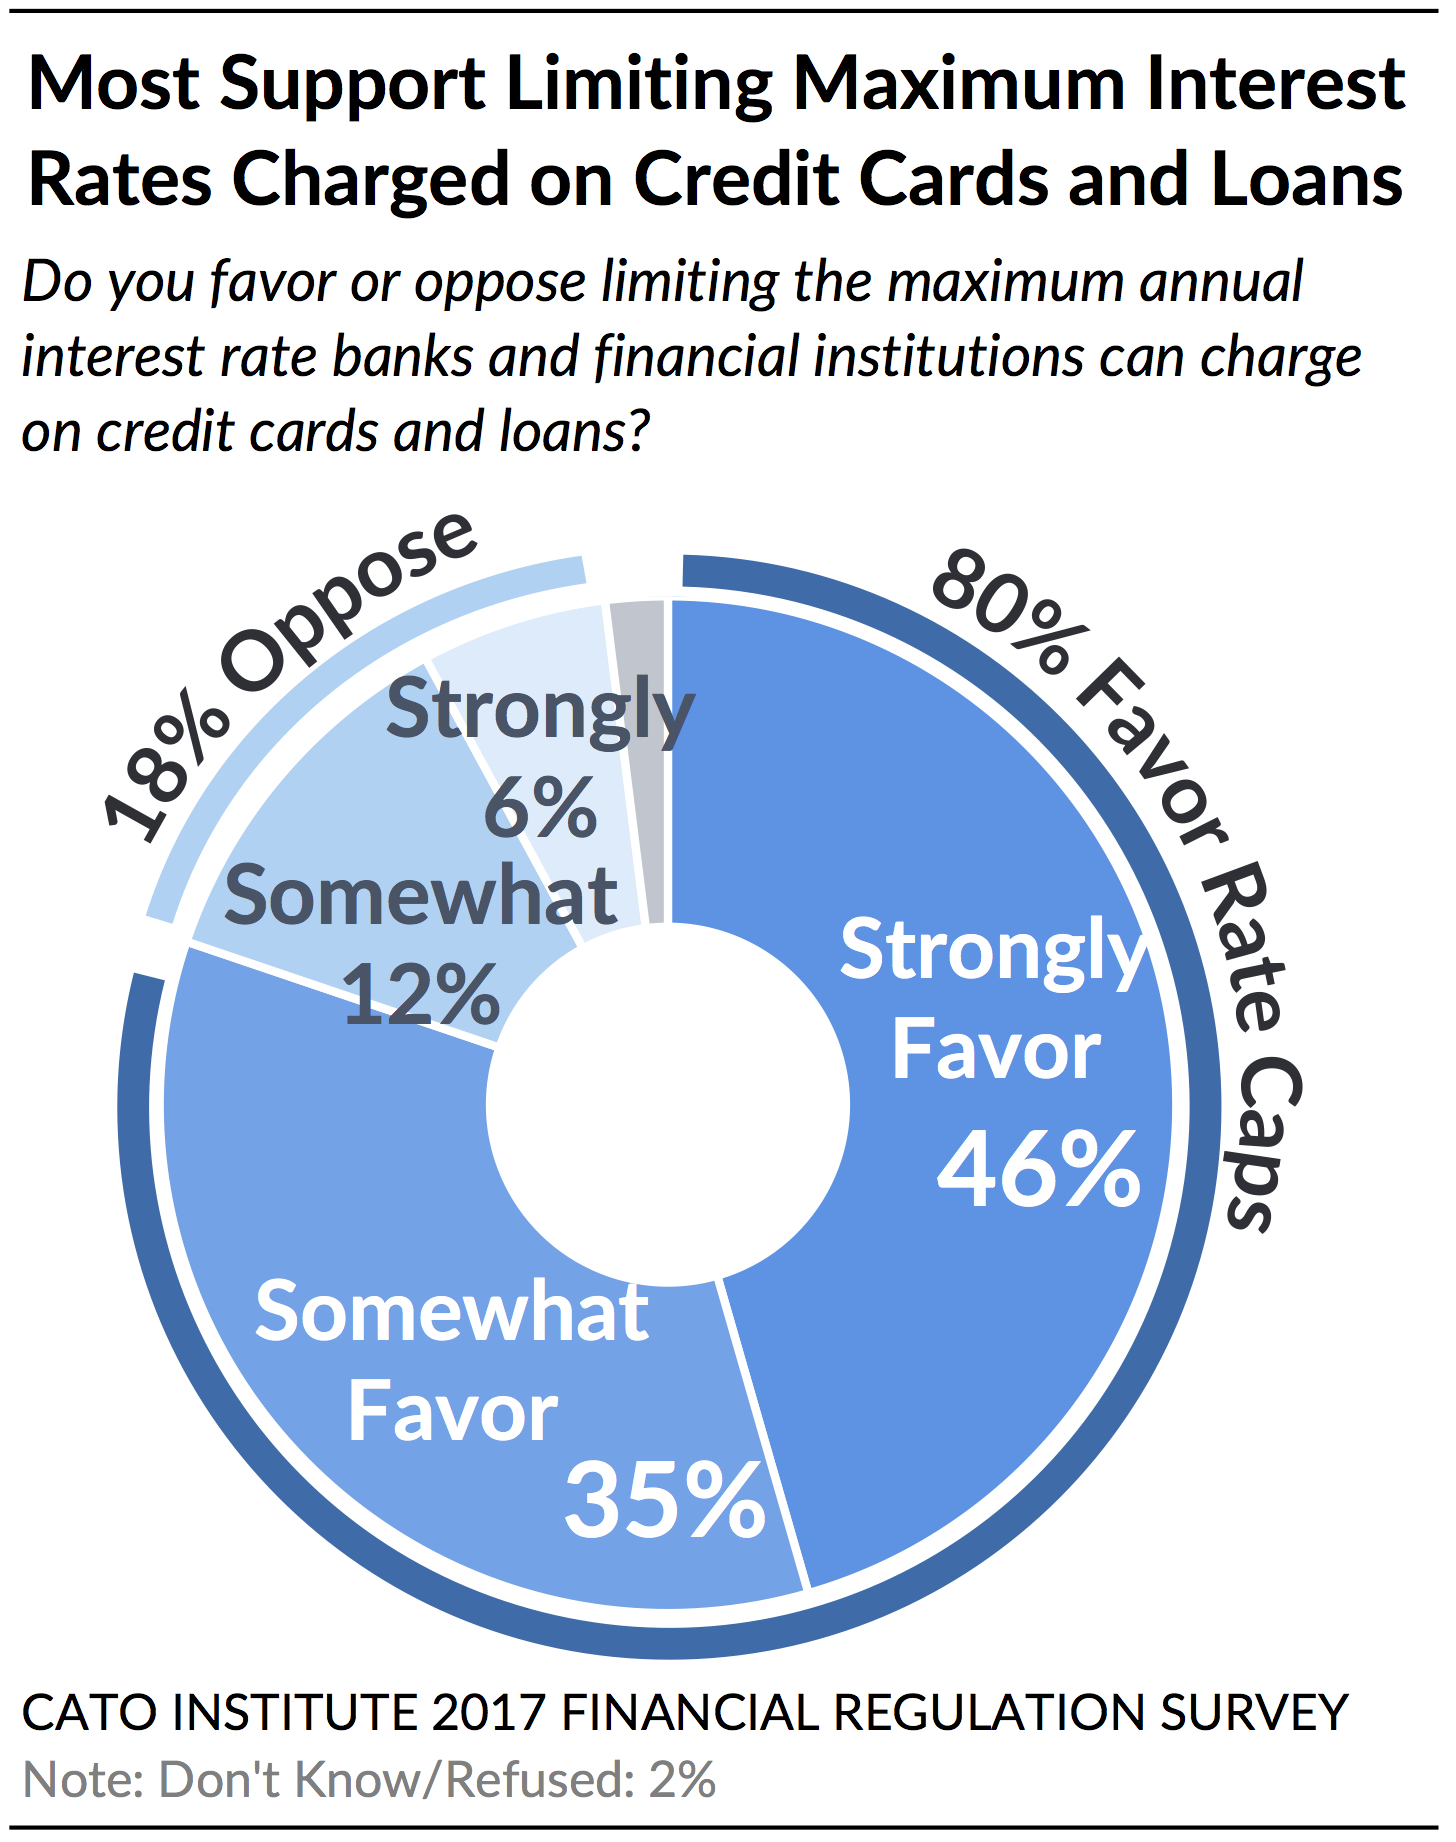 Wall Street vs  The Regulators: Public Attitudes on Banks